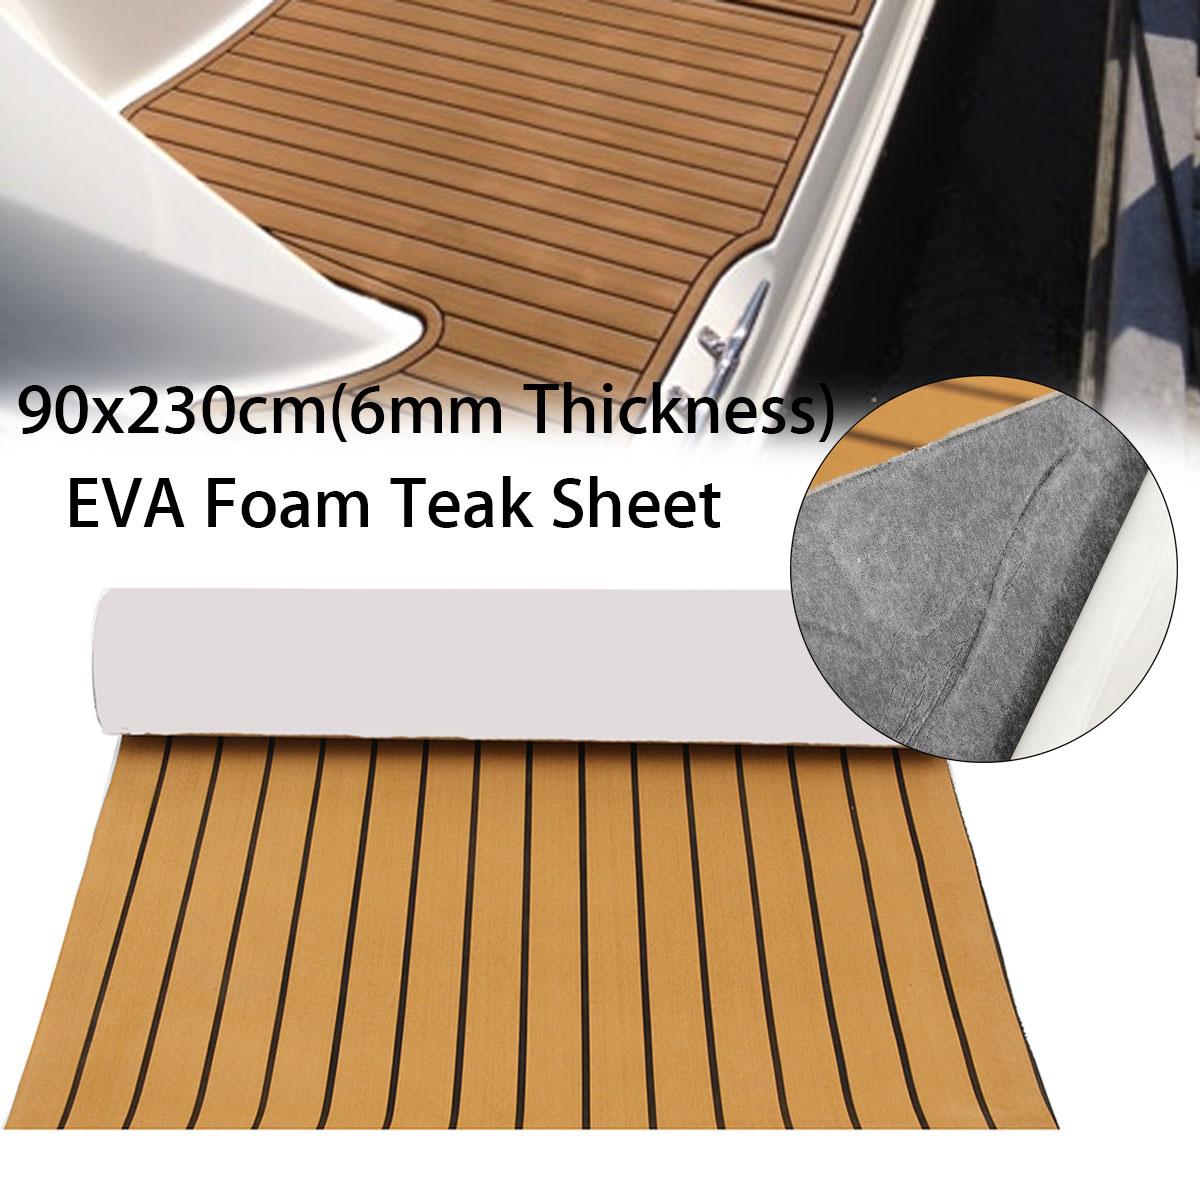 90x230cm Self-Adhesive EVA 6mm Marine Boat Synthetic Flooring EVA Foam Yacht Teak Decking Sheet Car Carpet Floor Mat Gold Black